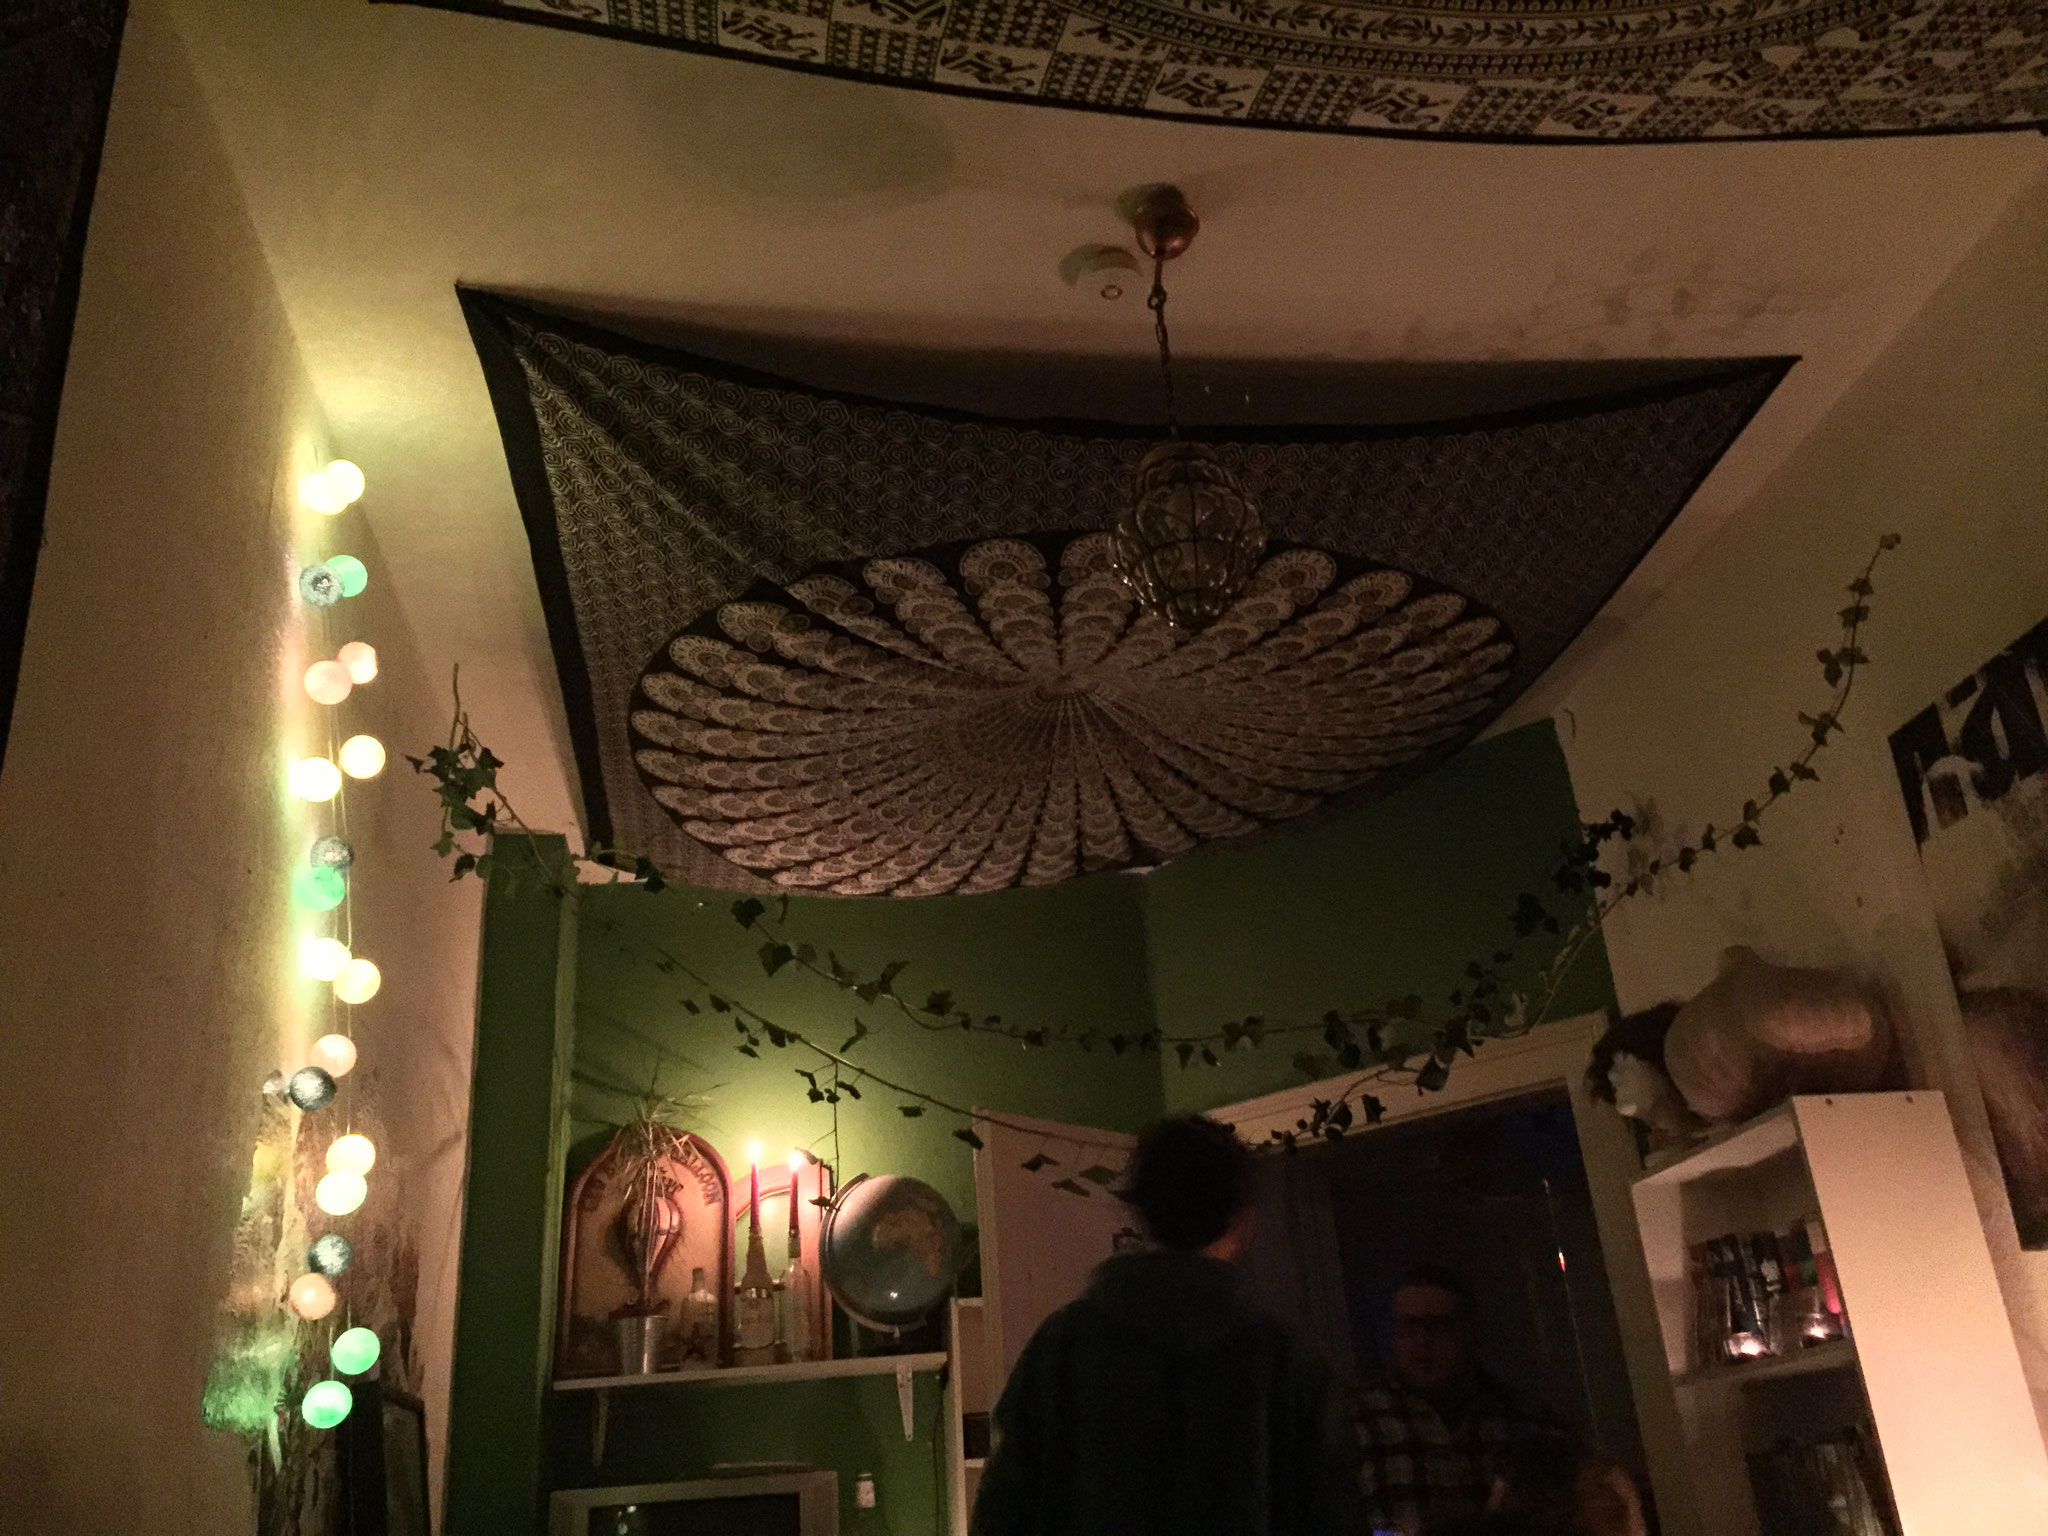 Wandtuch an Zimmerdecke als Party Dekoration